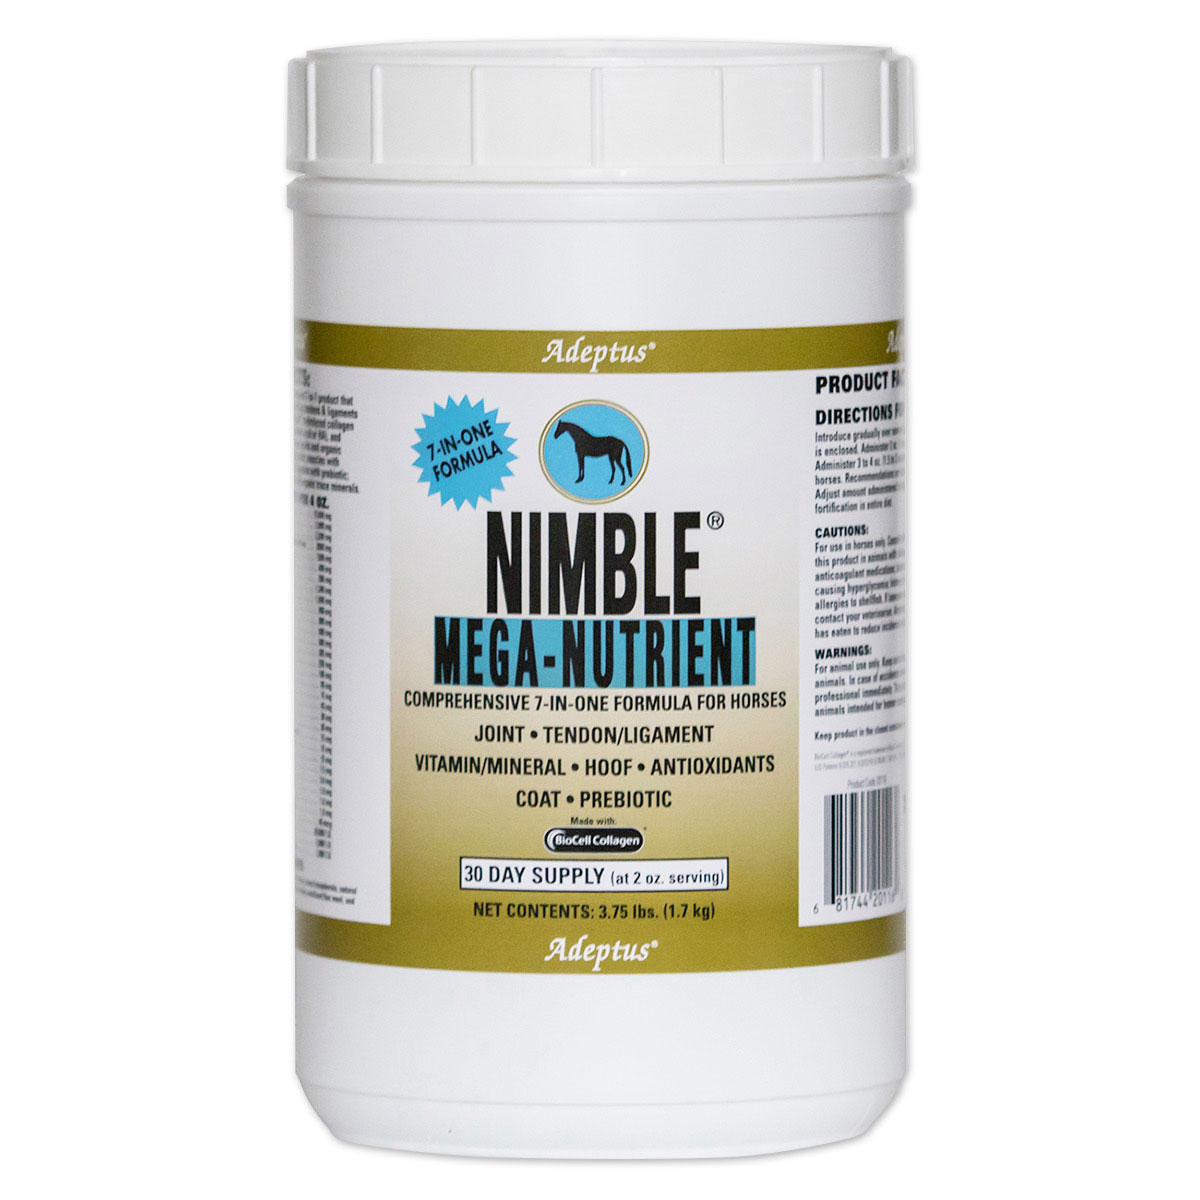 Nimble Mega-Nutrient®